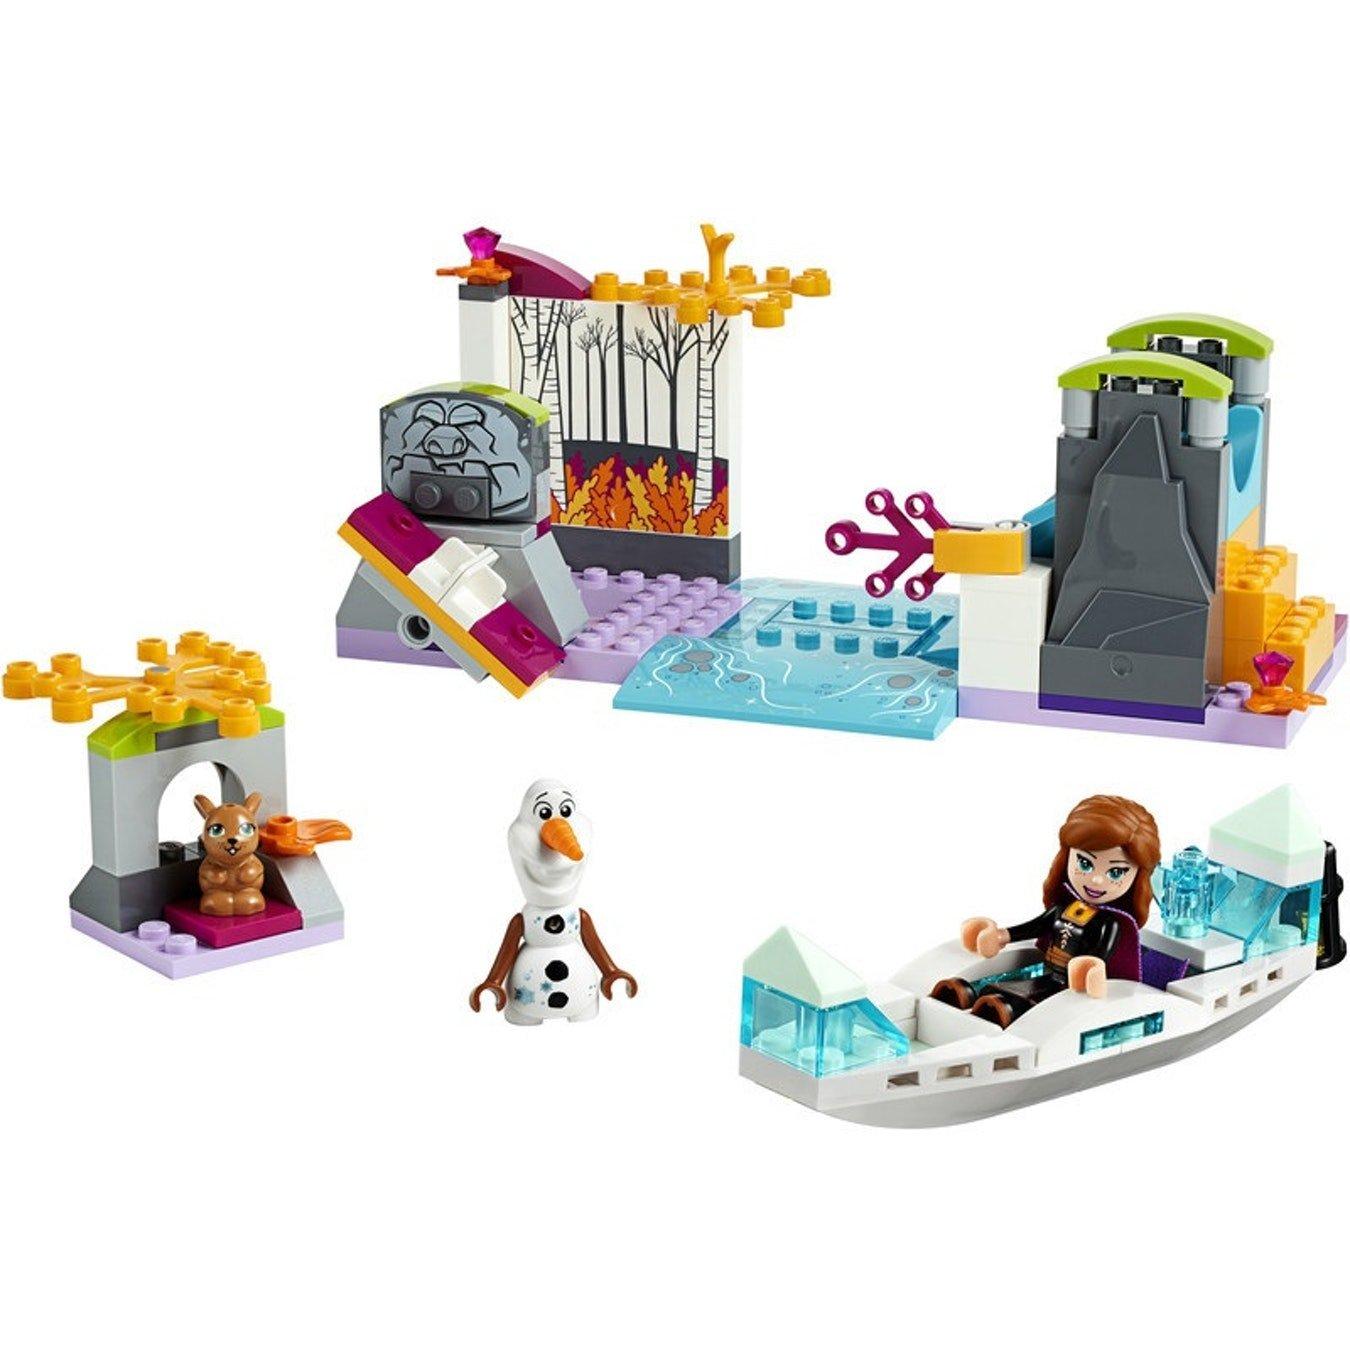 LEGO - Disney Frozen - Anna's Canoe Expedition (41165)